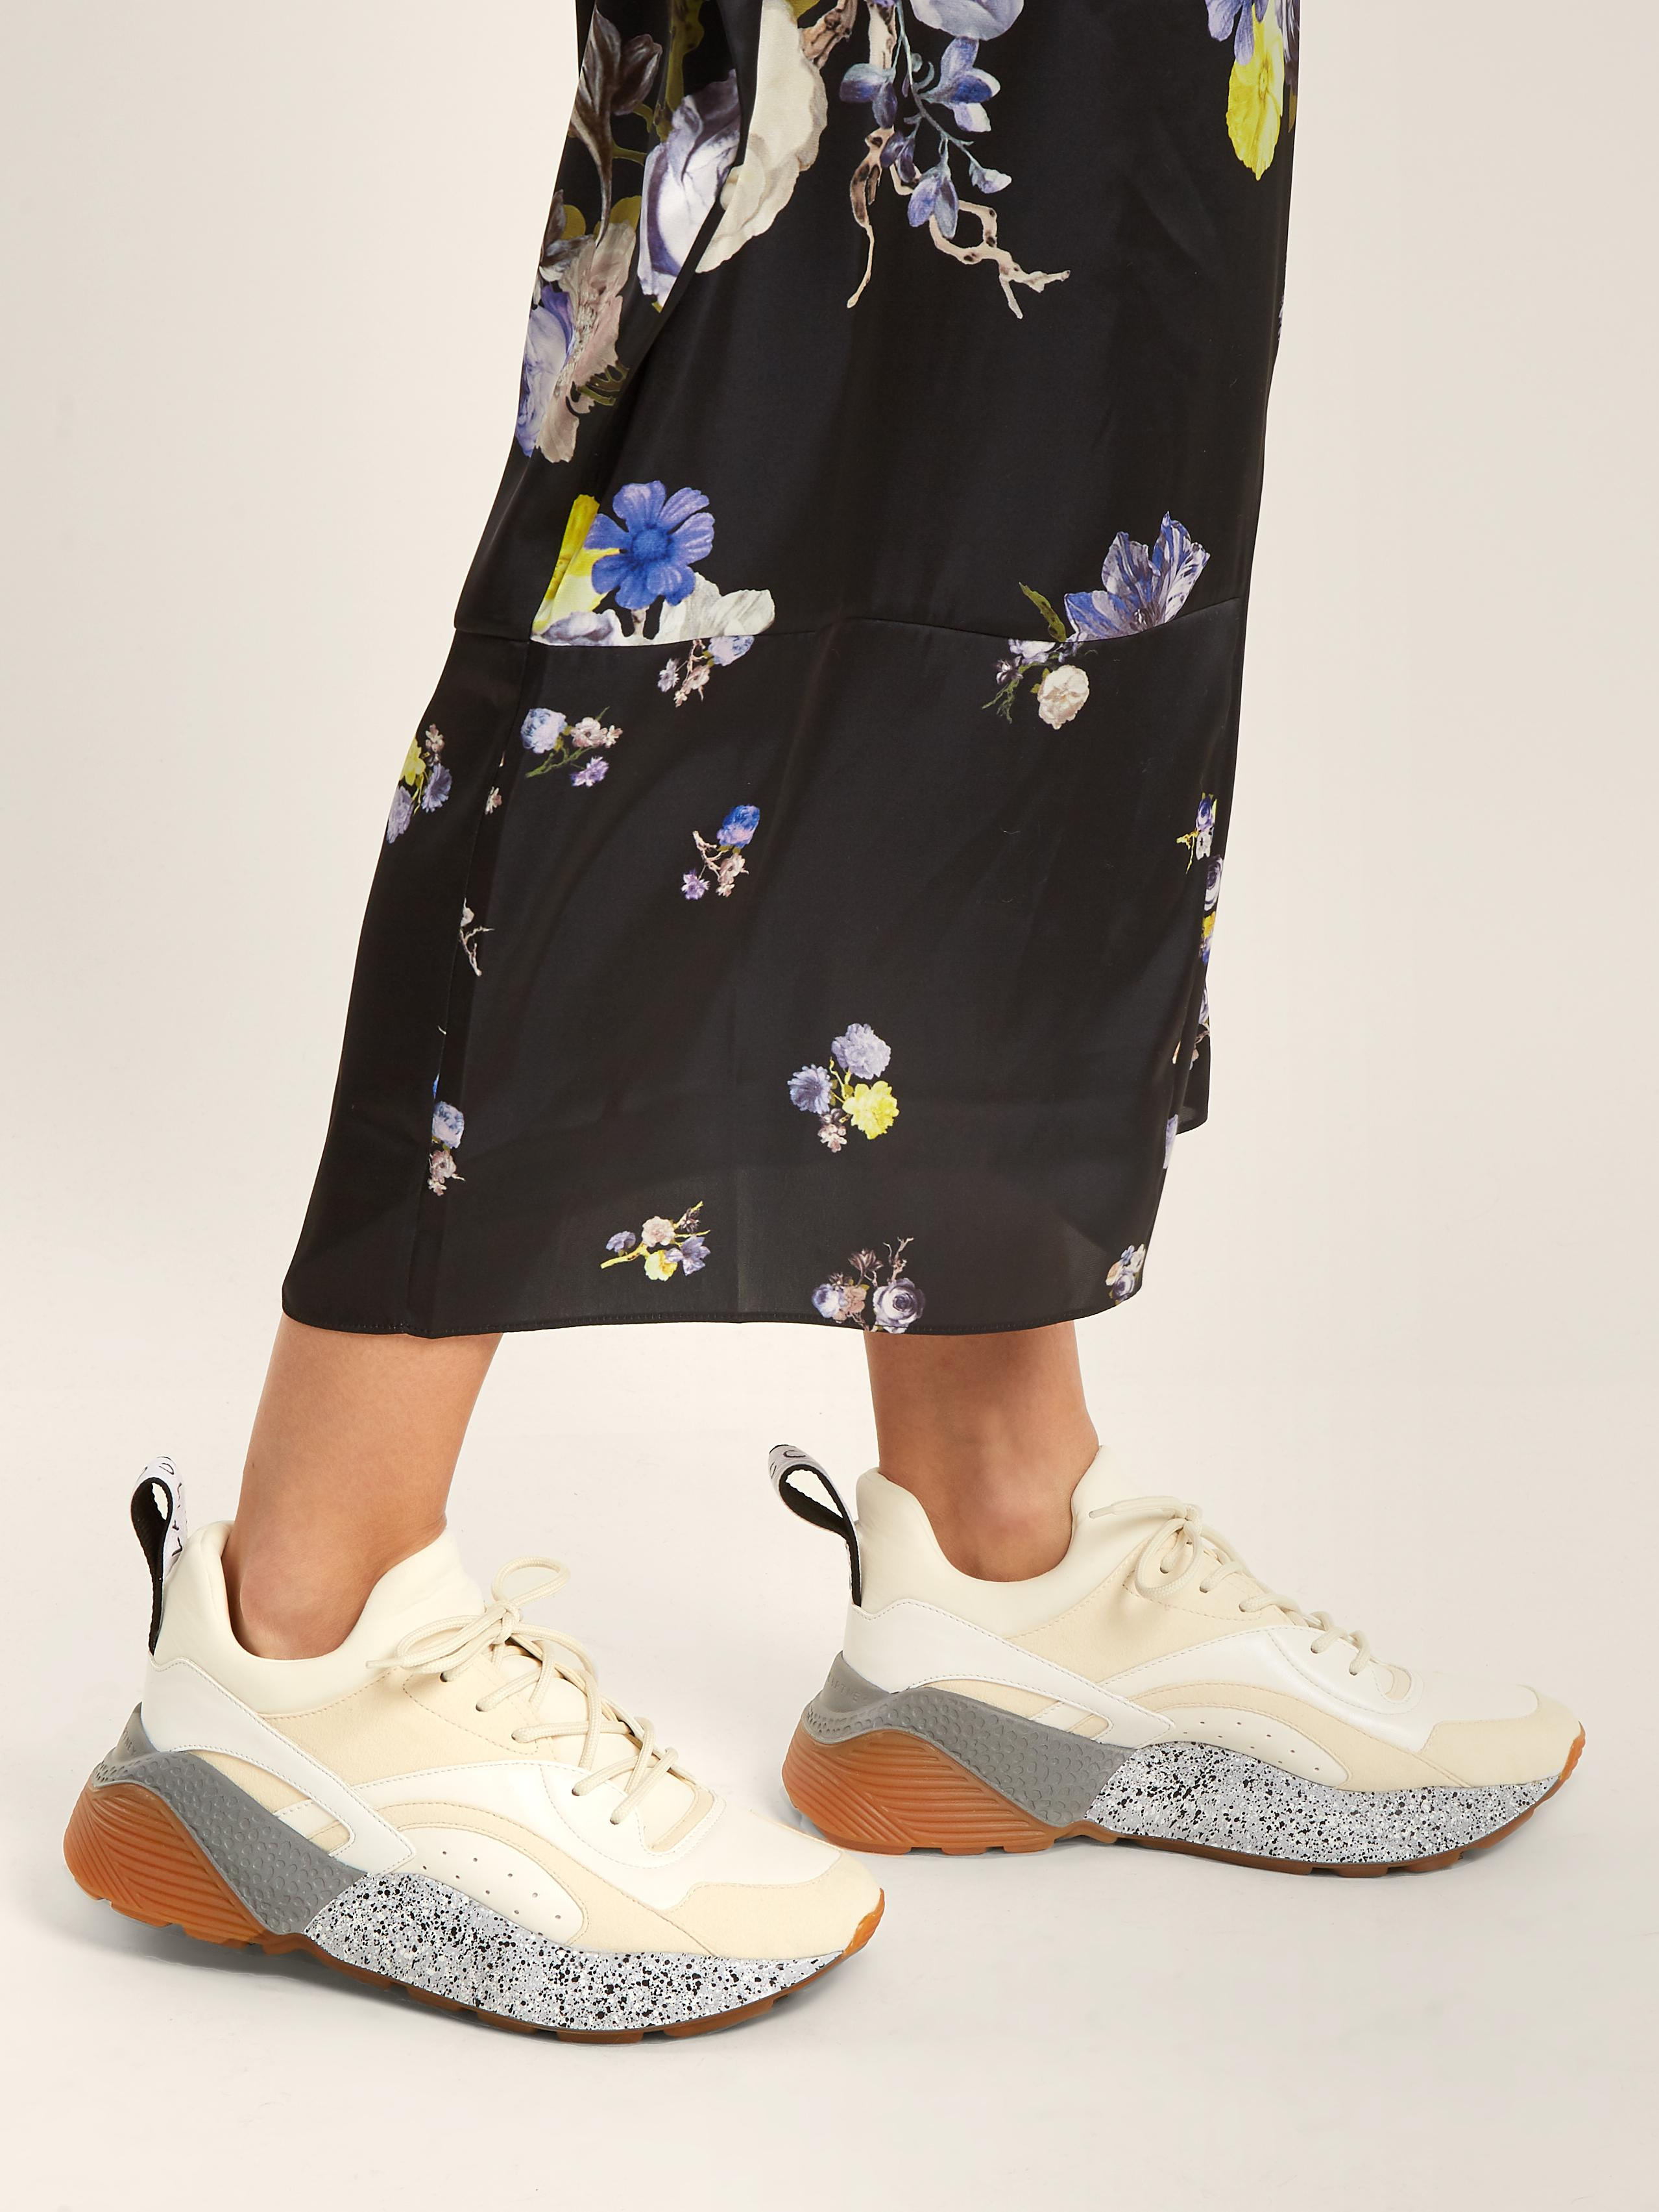 Stella McCartney Eclipse sneakers SIIhmkIGk